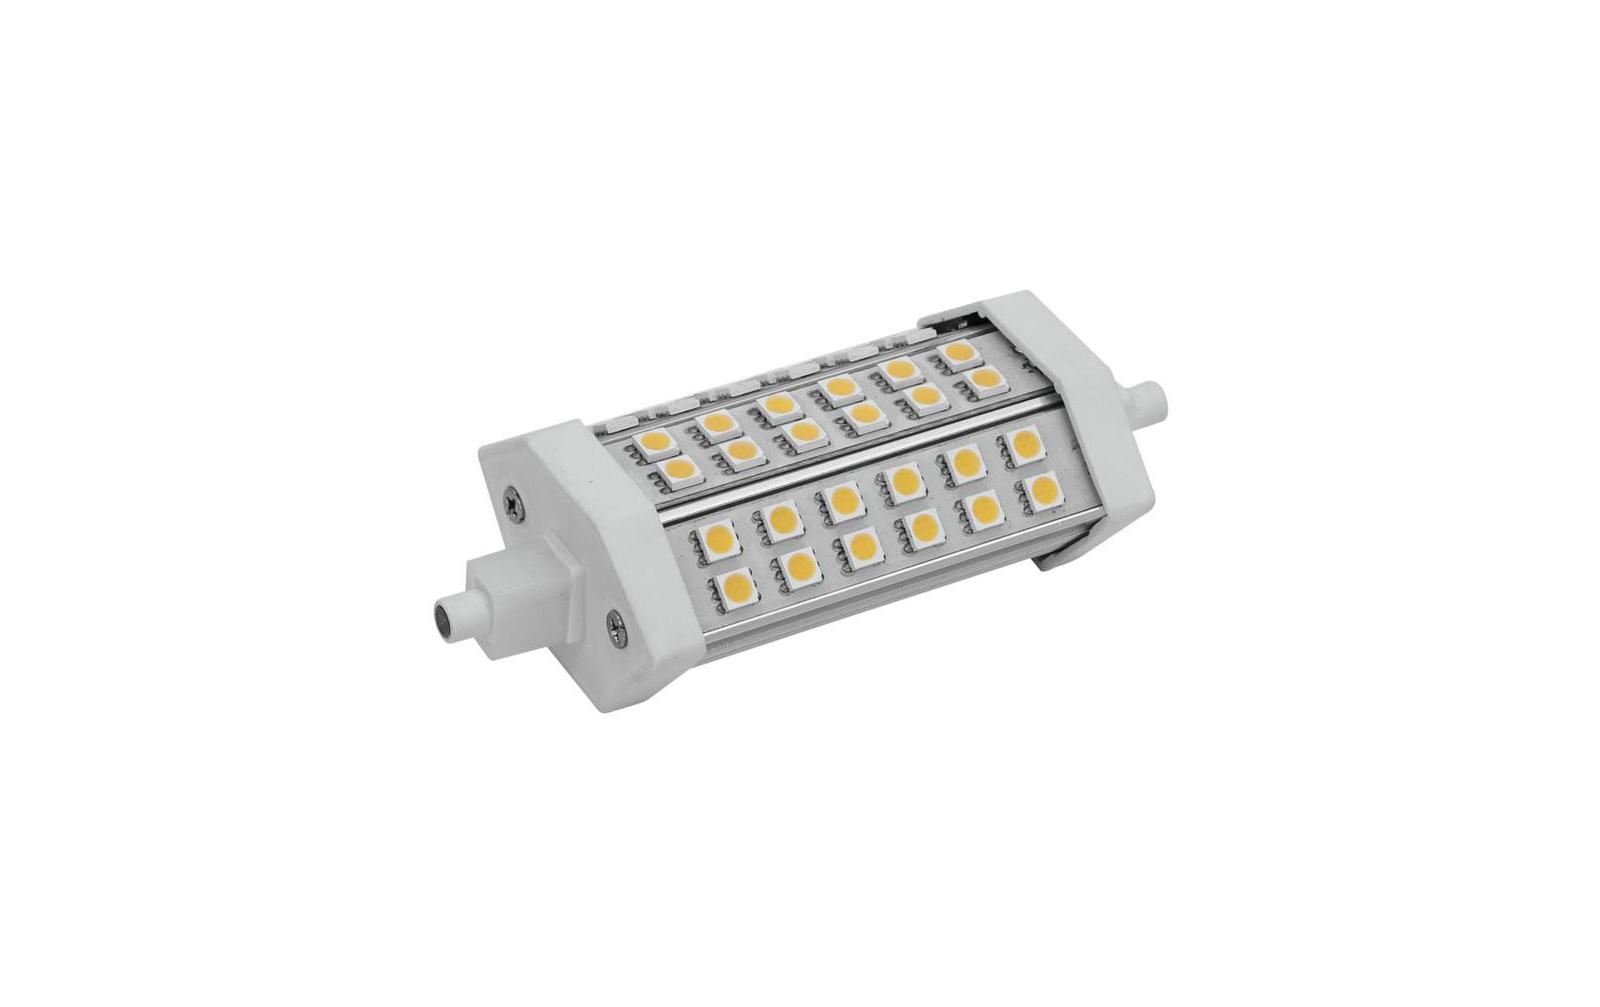 omnilux-led-r7s-230v-8w-3000k-smd5050-dimmbar